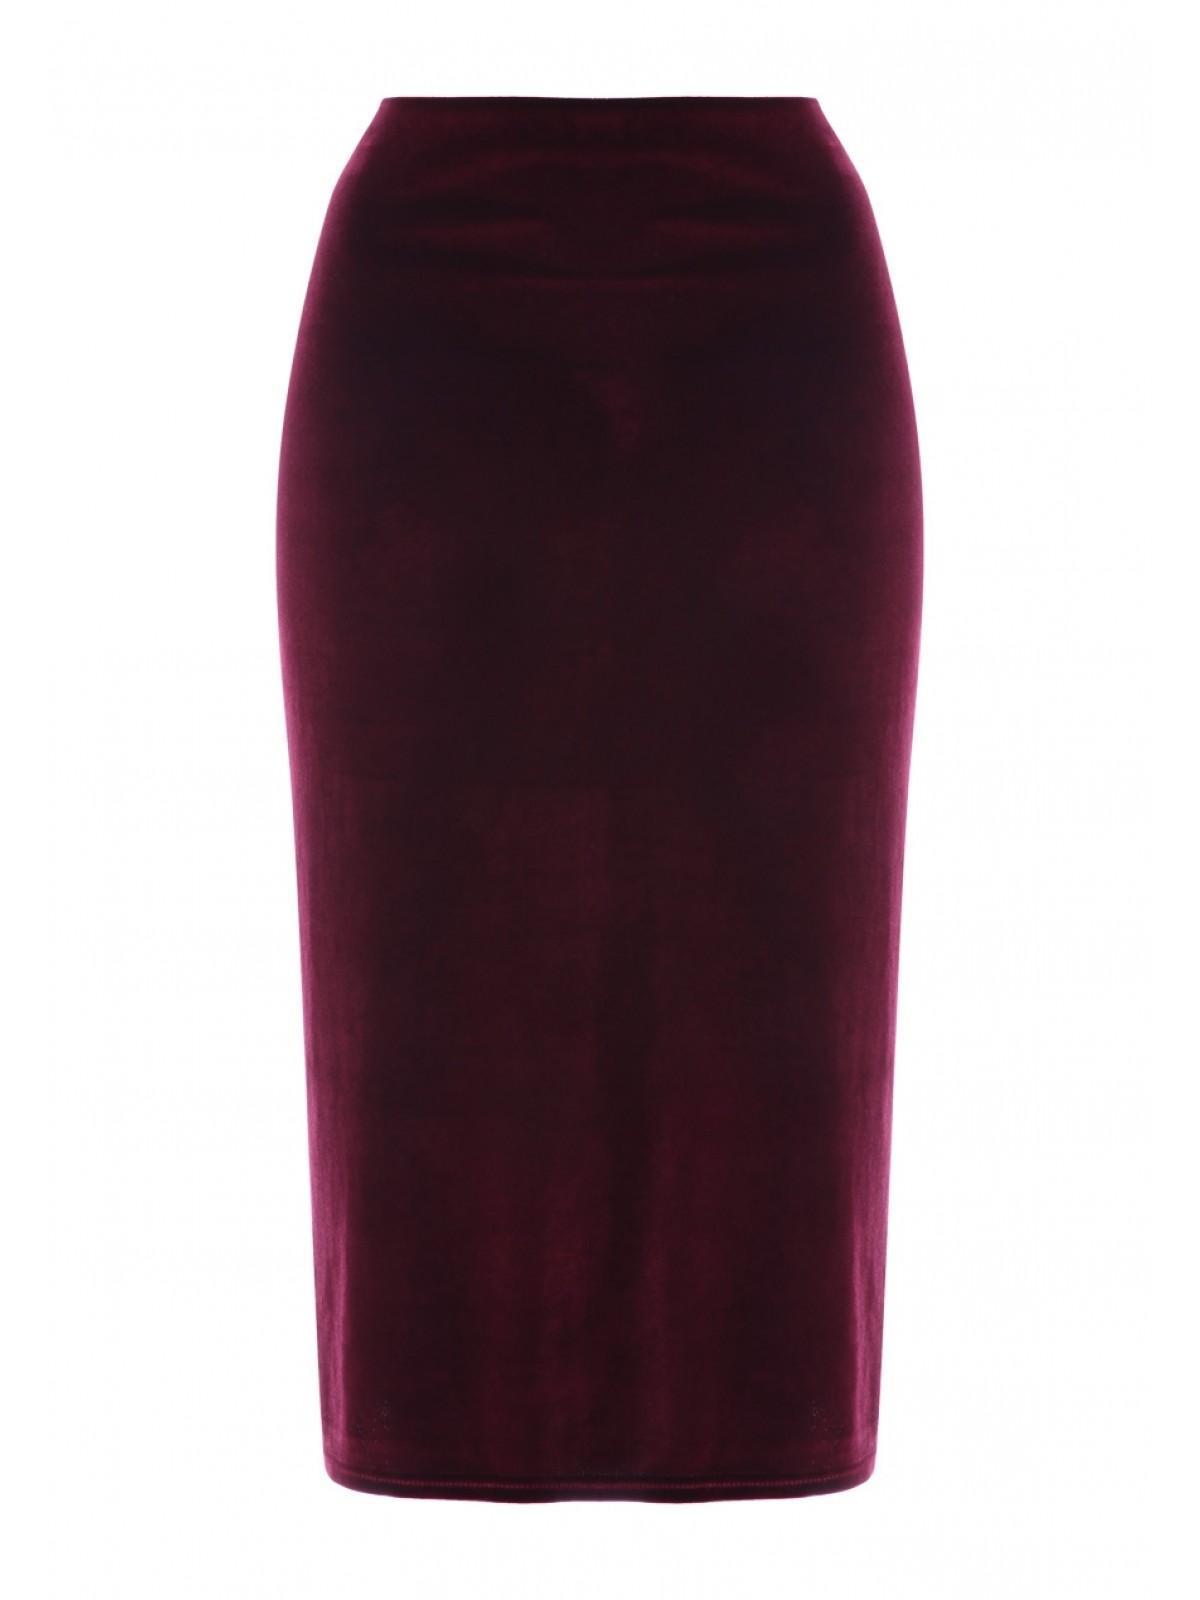 5da4e3d6c9 Home; Womens Wine Velvet Pencil Skirt. Back. PreviousNext